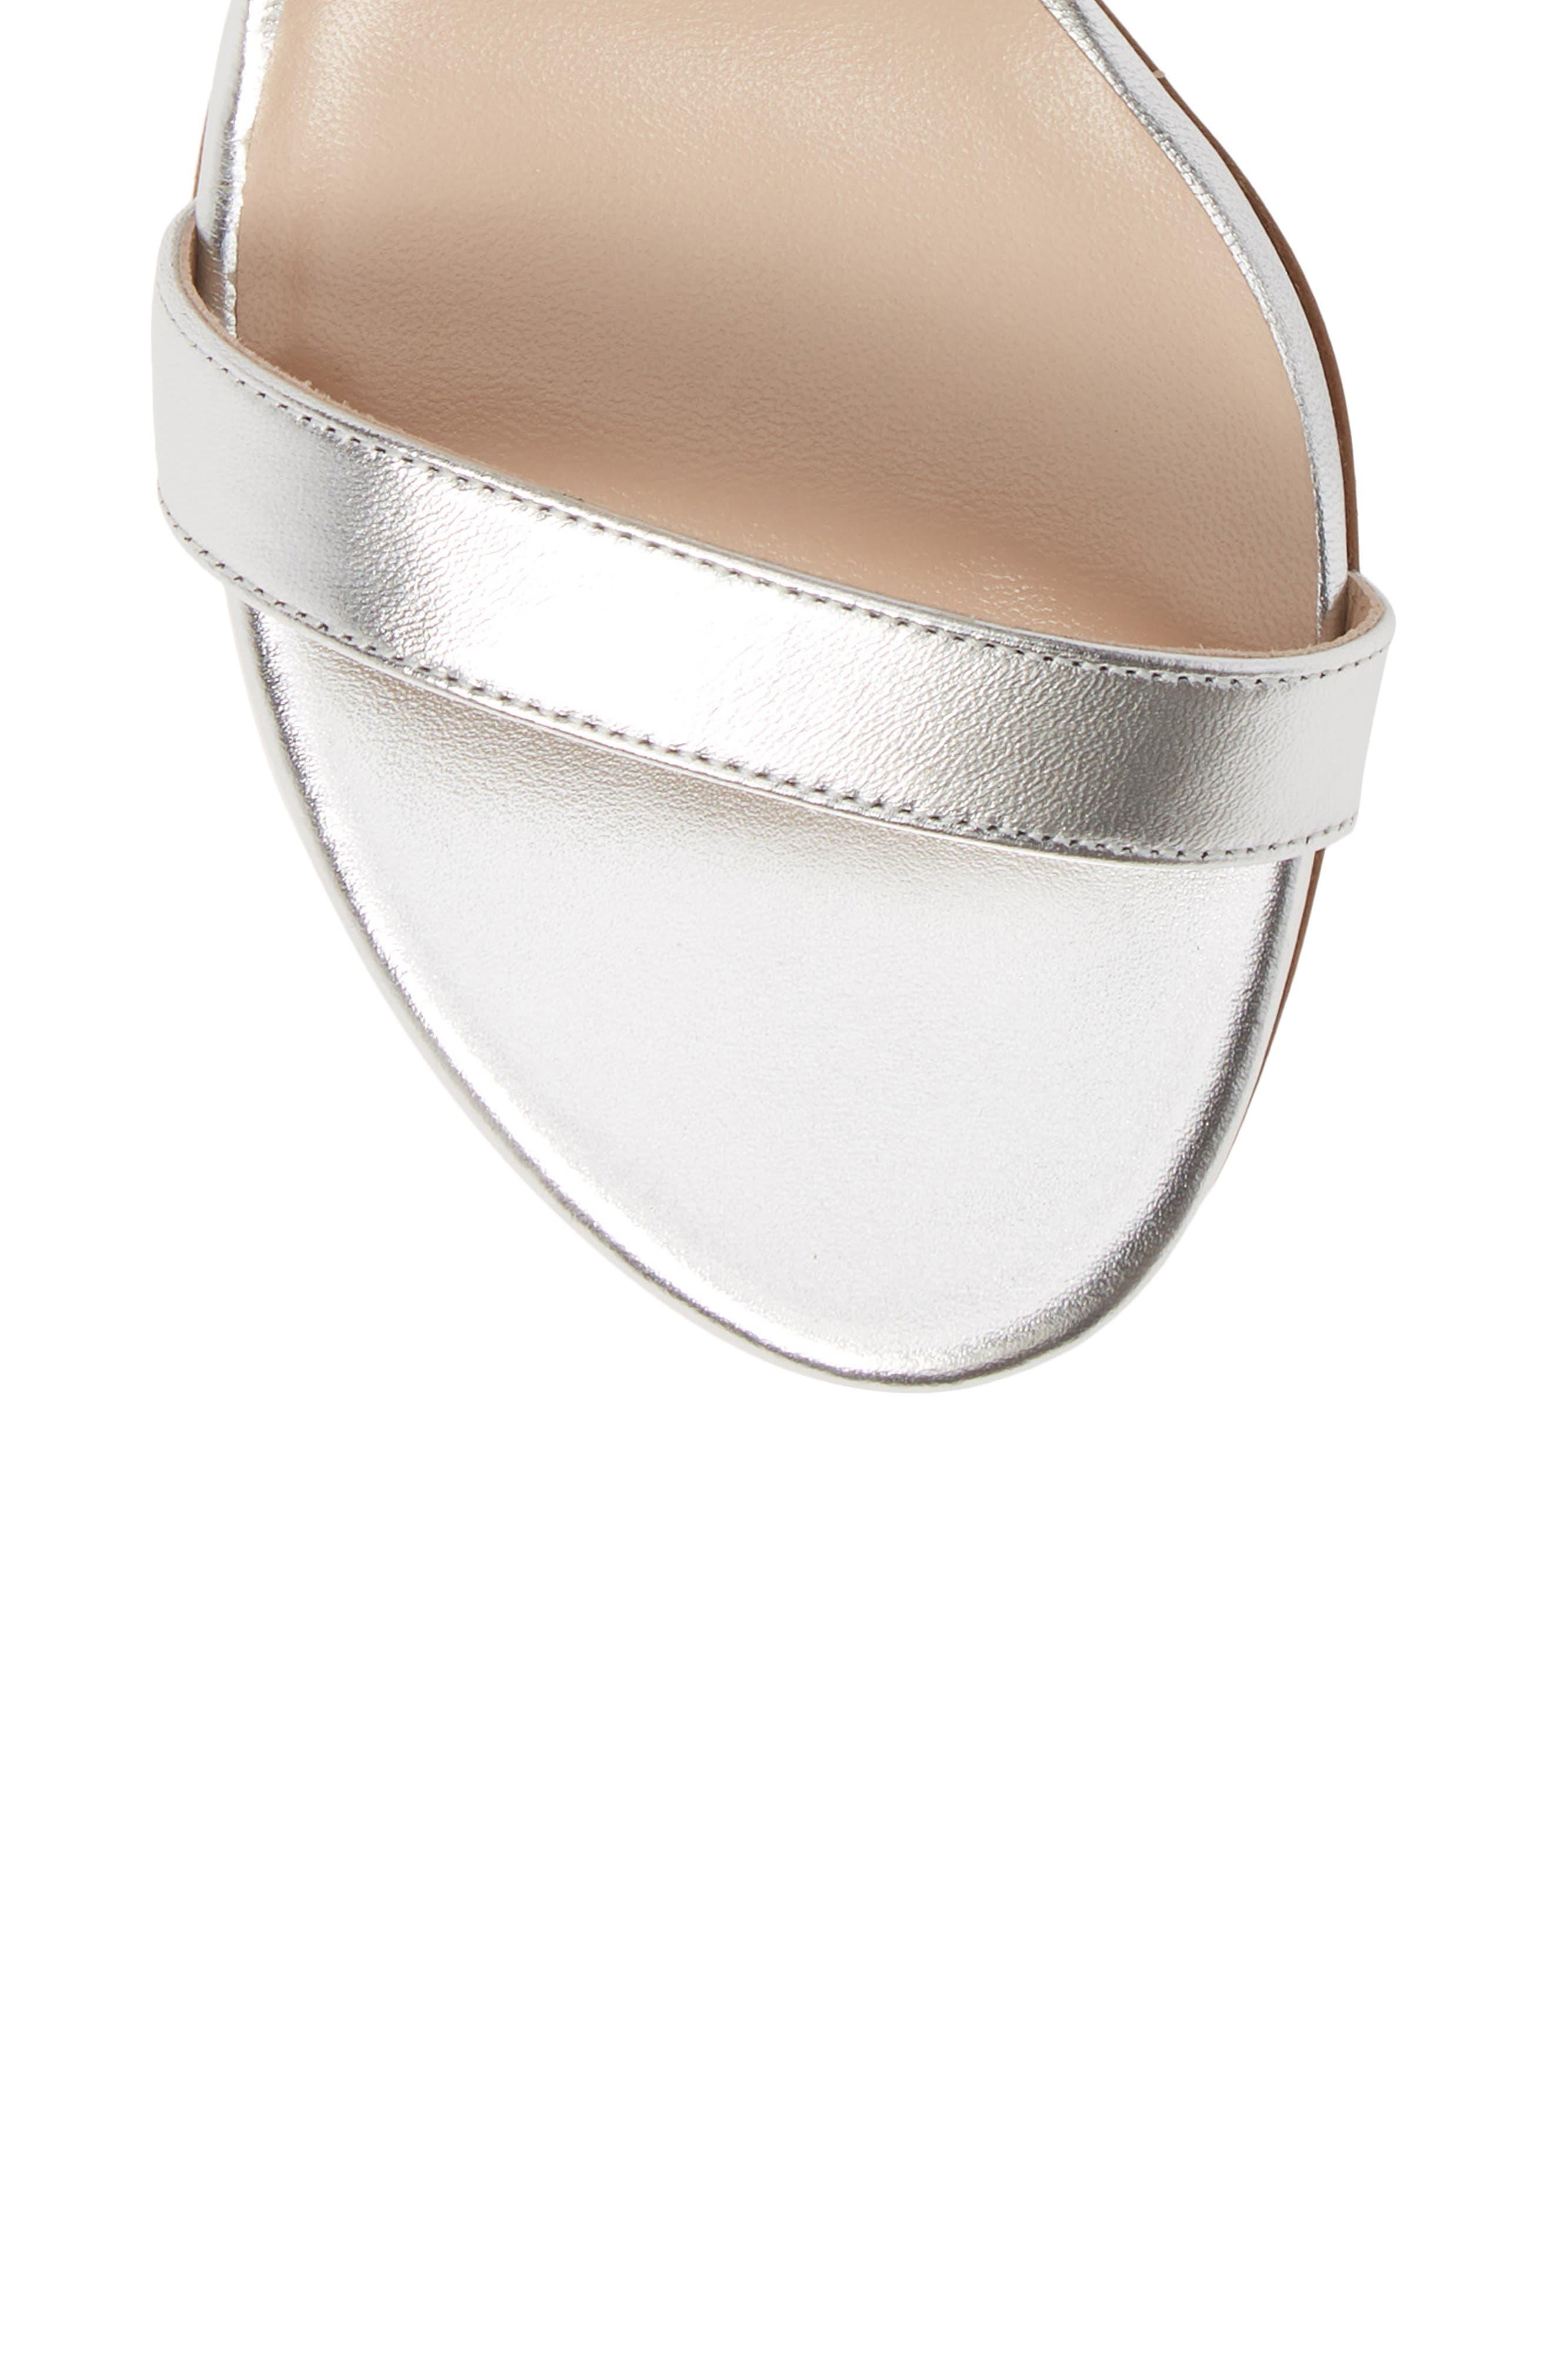 STUART WEITZMAN,                             NearlyNude Ankle Strap Sandal,                             Alternate thumbnail 5, color,                             SILVER METALLIC NAPPA